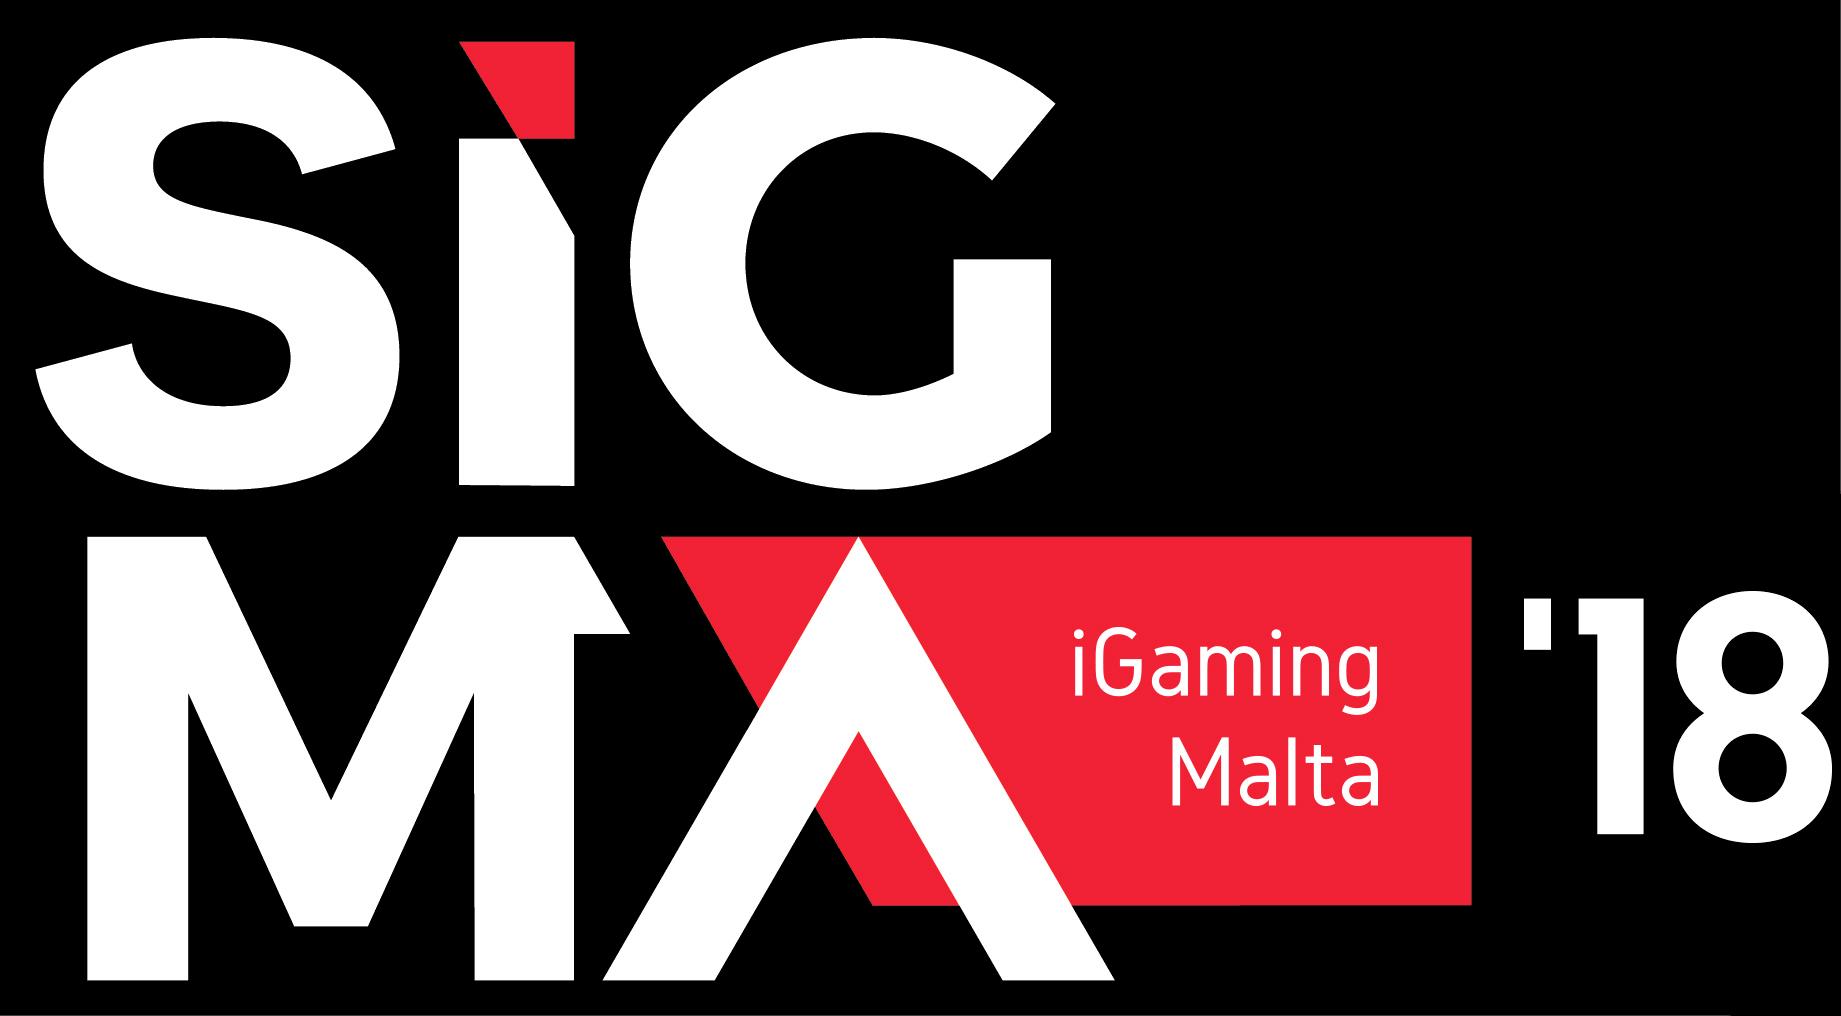 SIGMA iGAMING MALTA